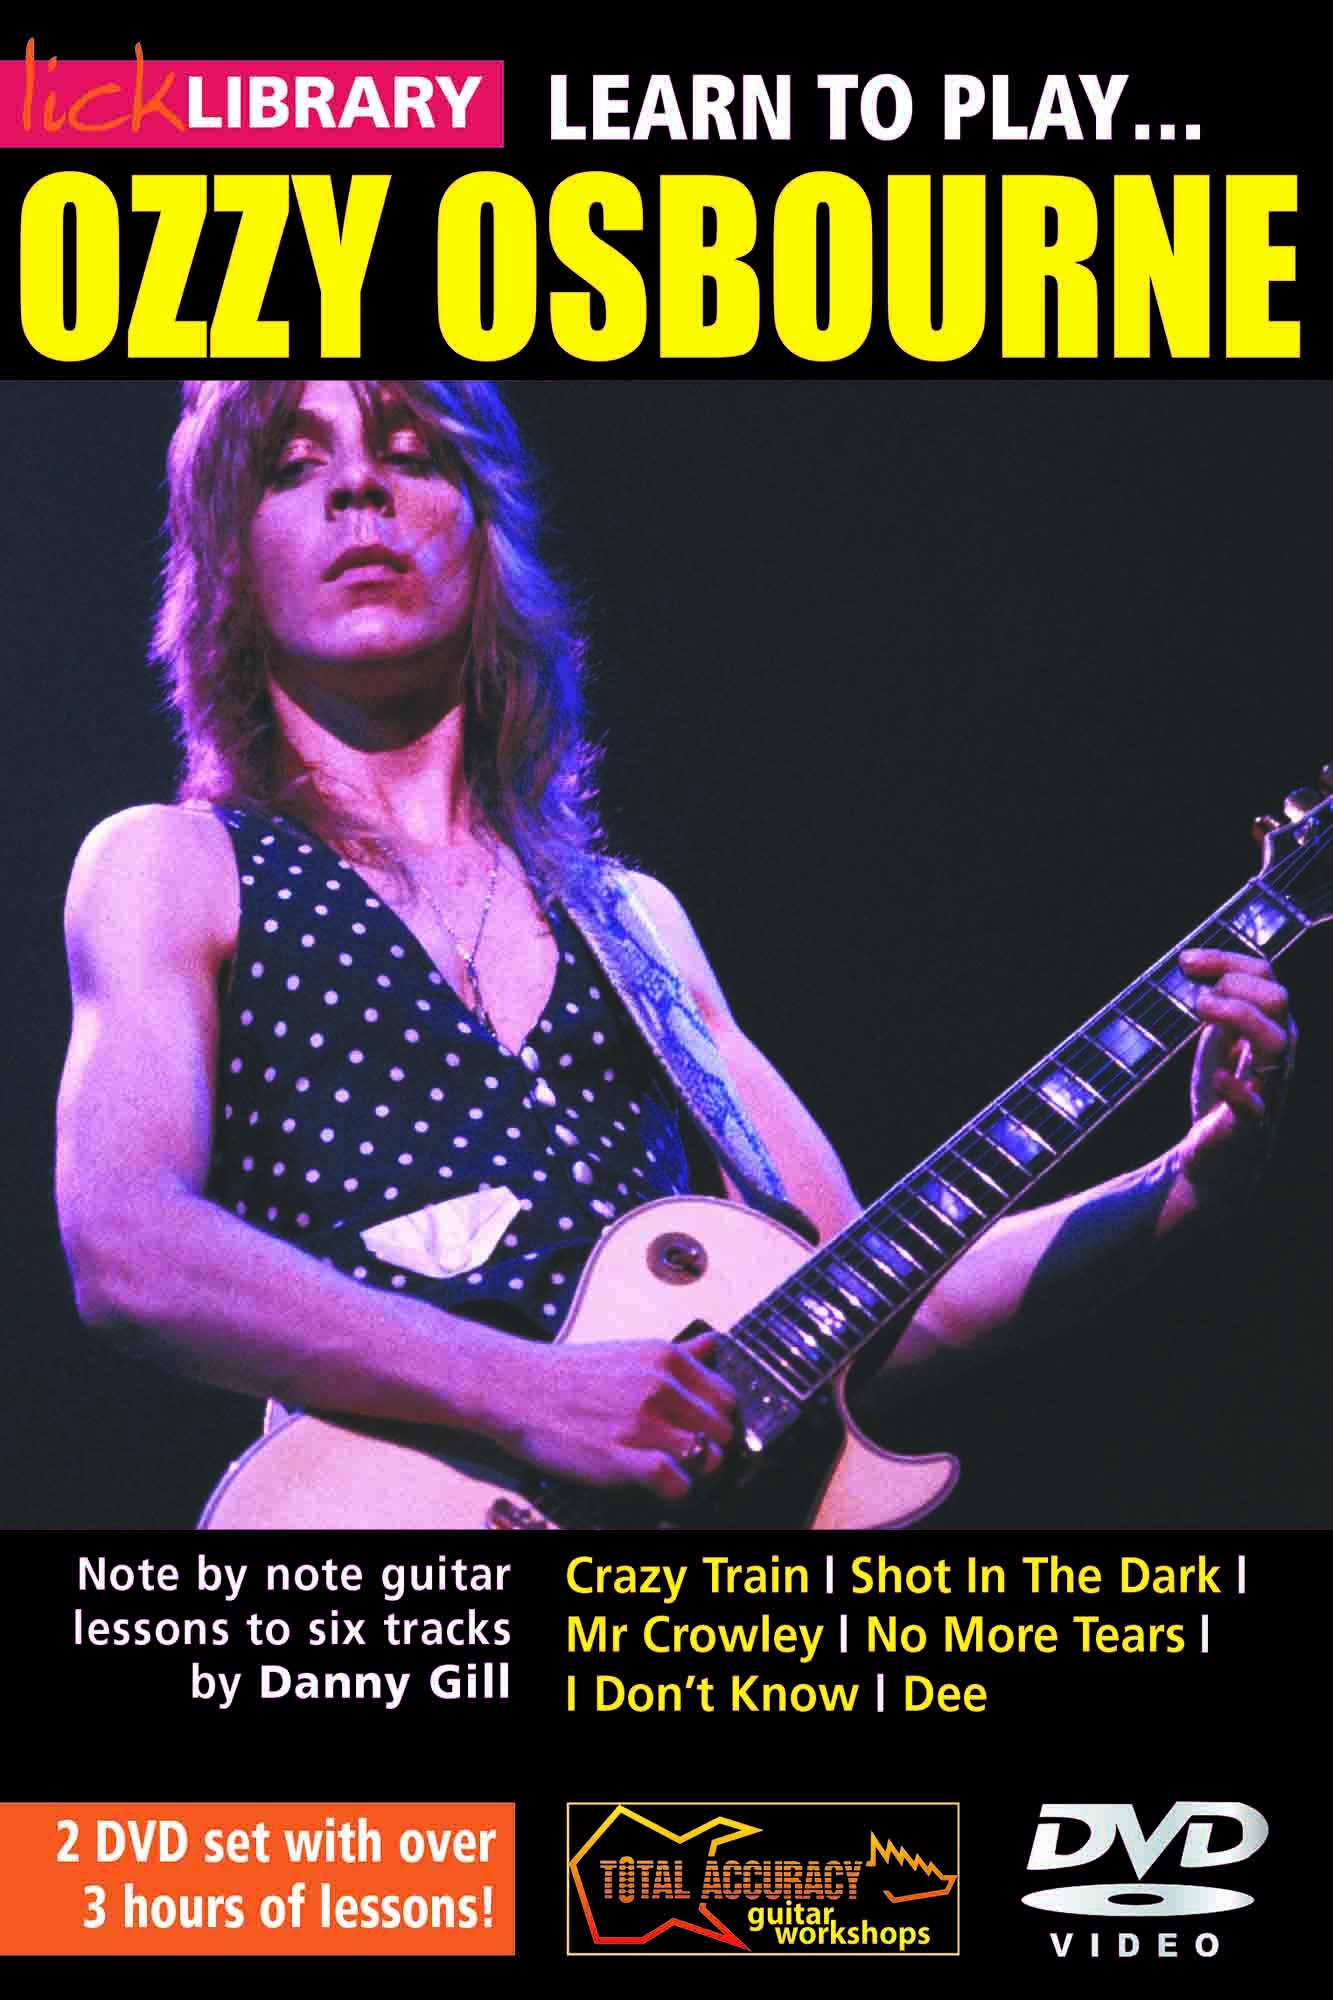 Learn To Play Ozzy Osbourne